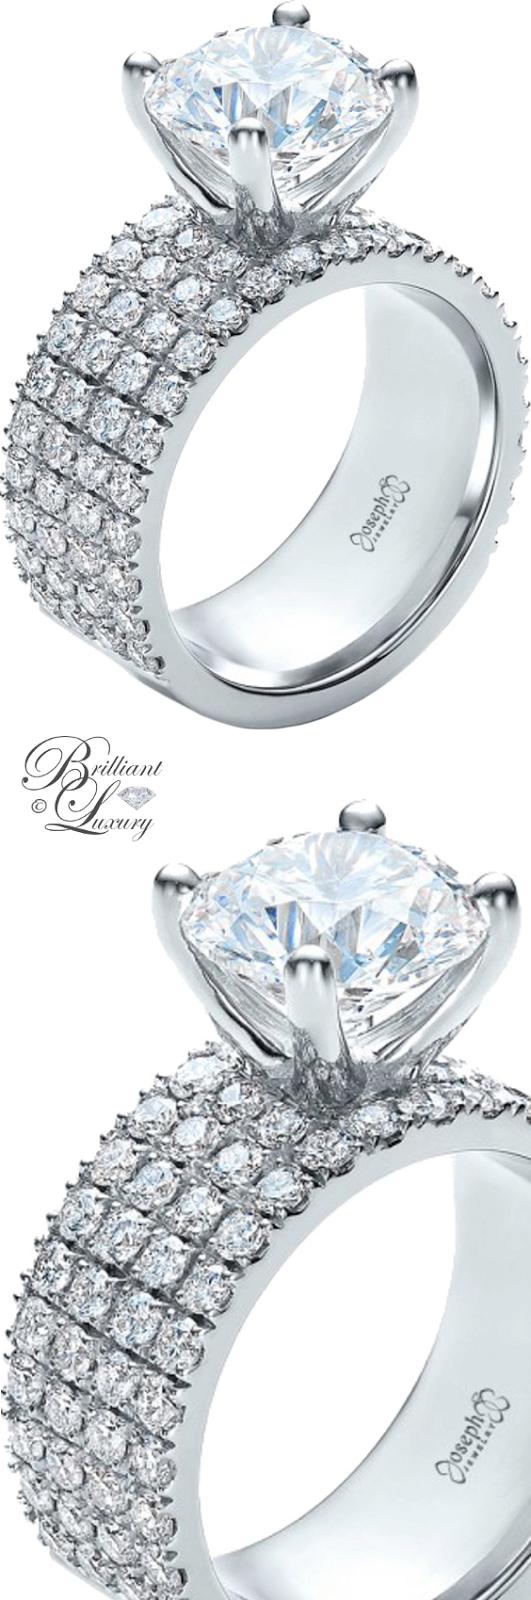 Brilliant Luxury ♦ Custom Diamond Engagement Ring